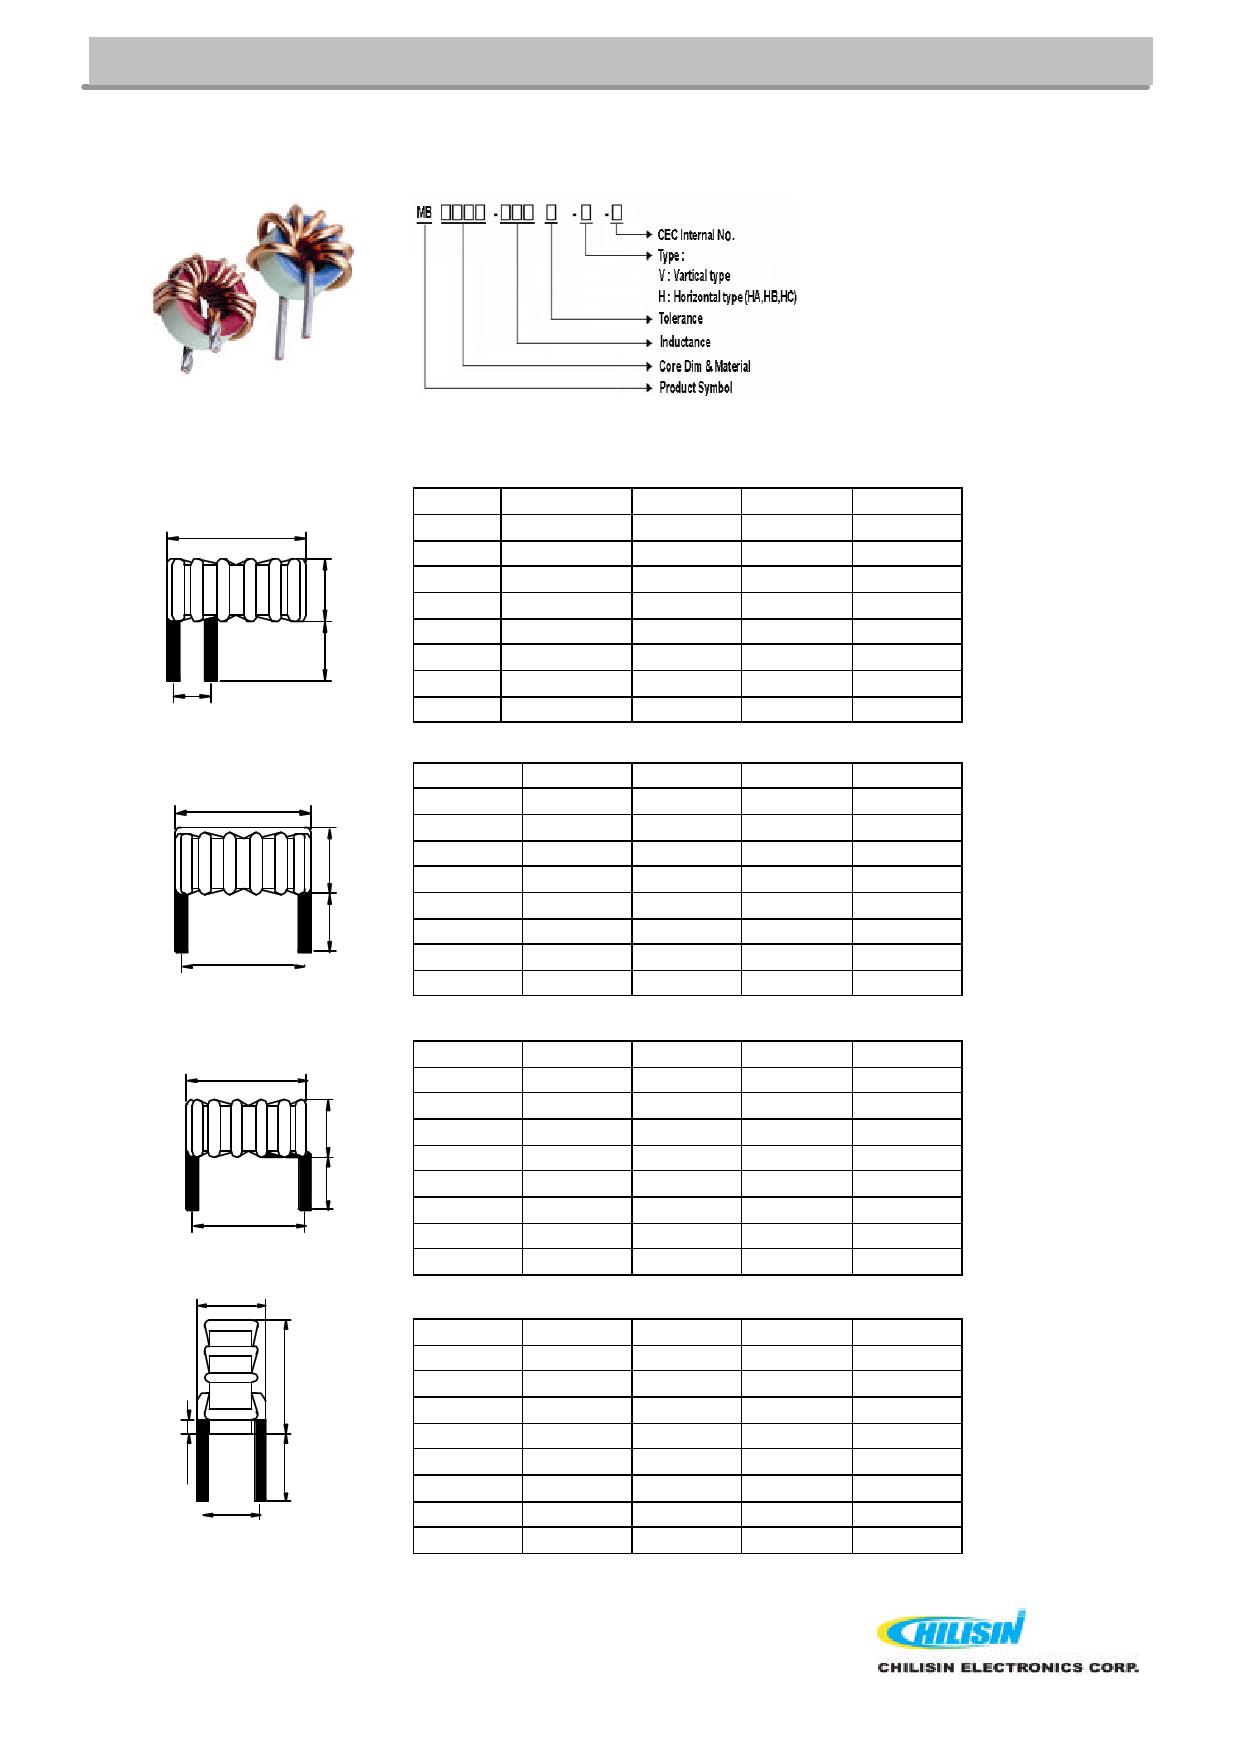 MB5052 데이터시트 및 MB5052 PDF